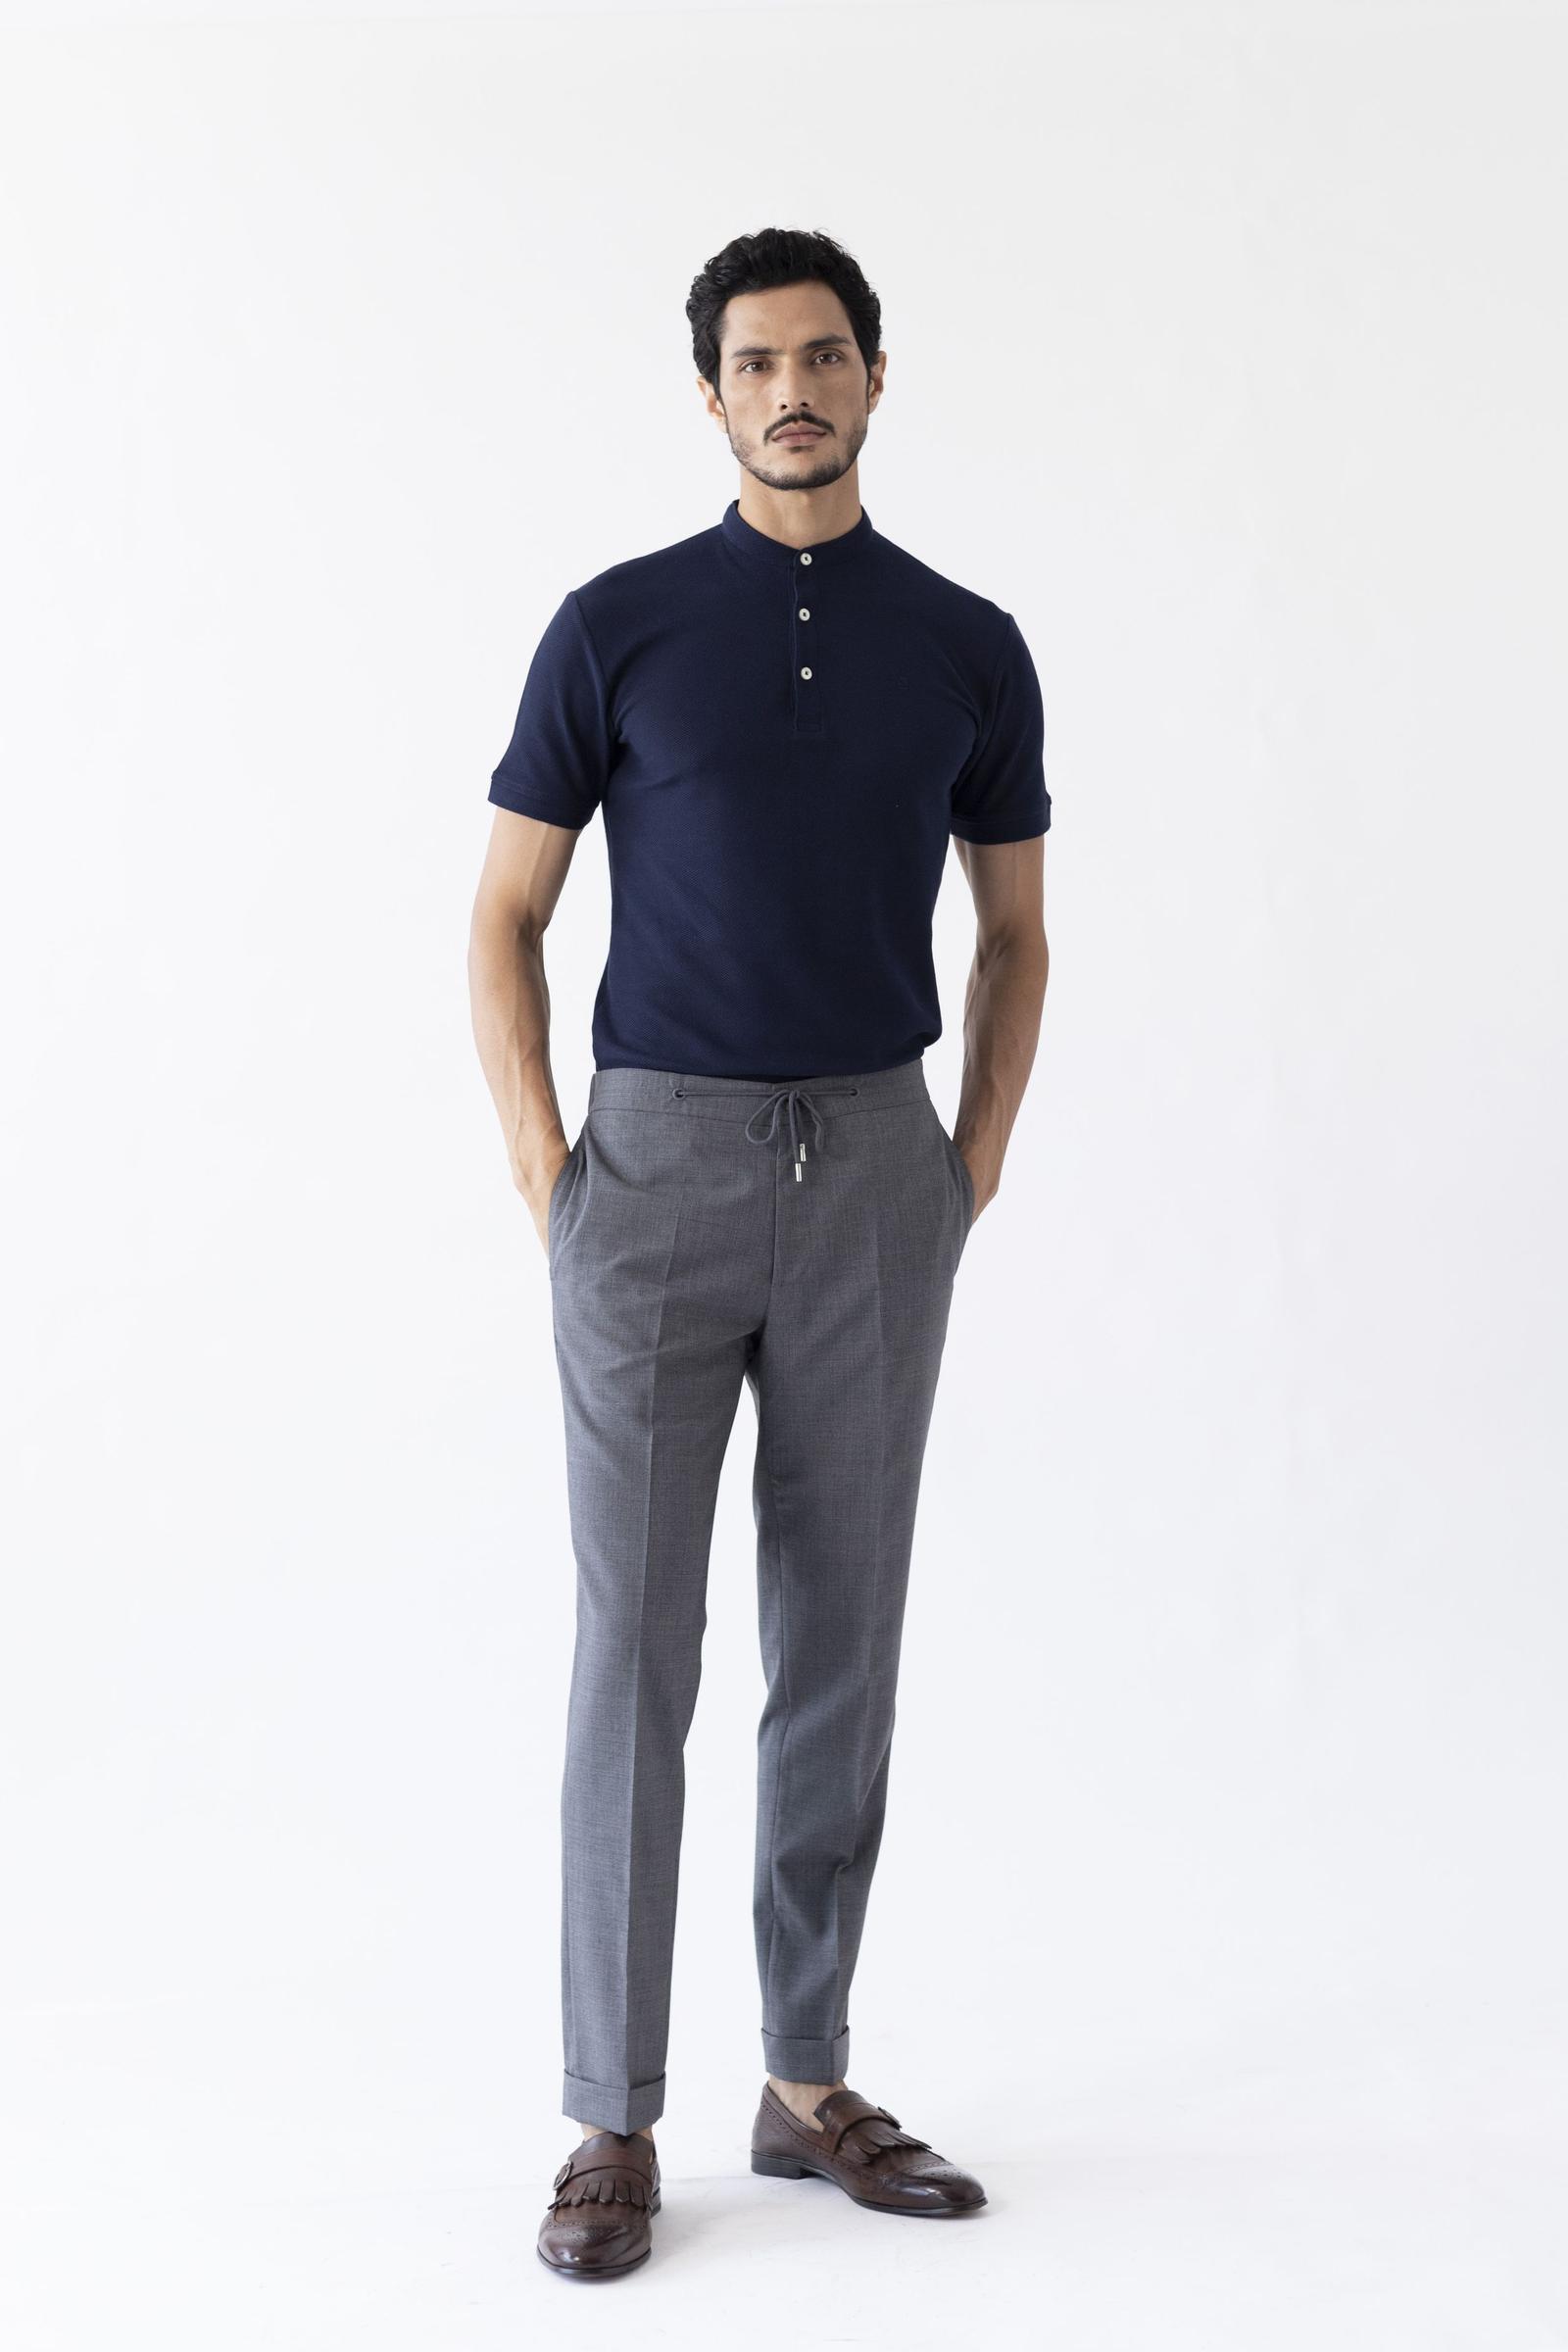 Walkman Trouser - Grey